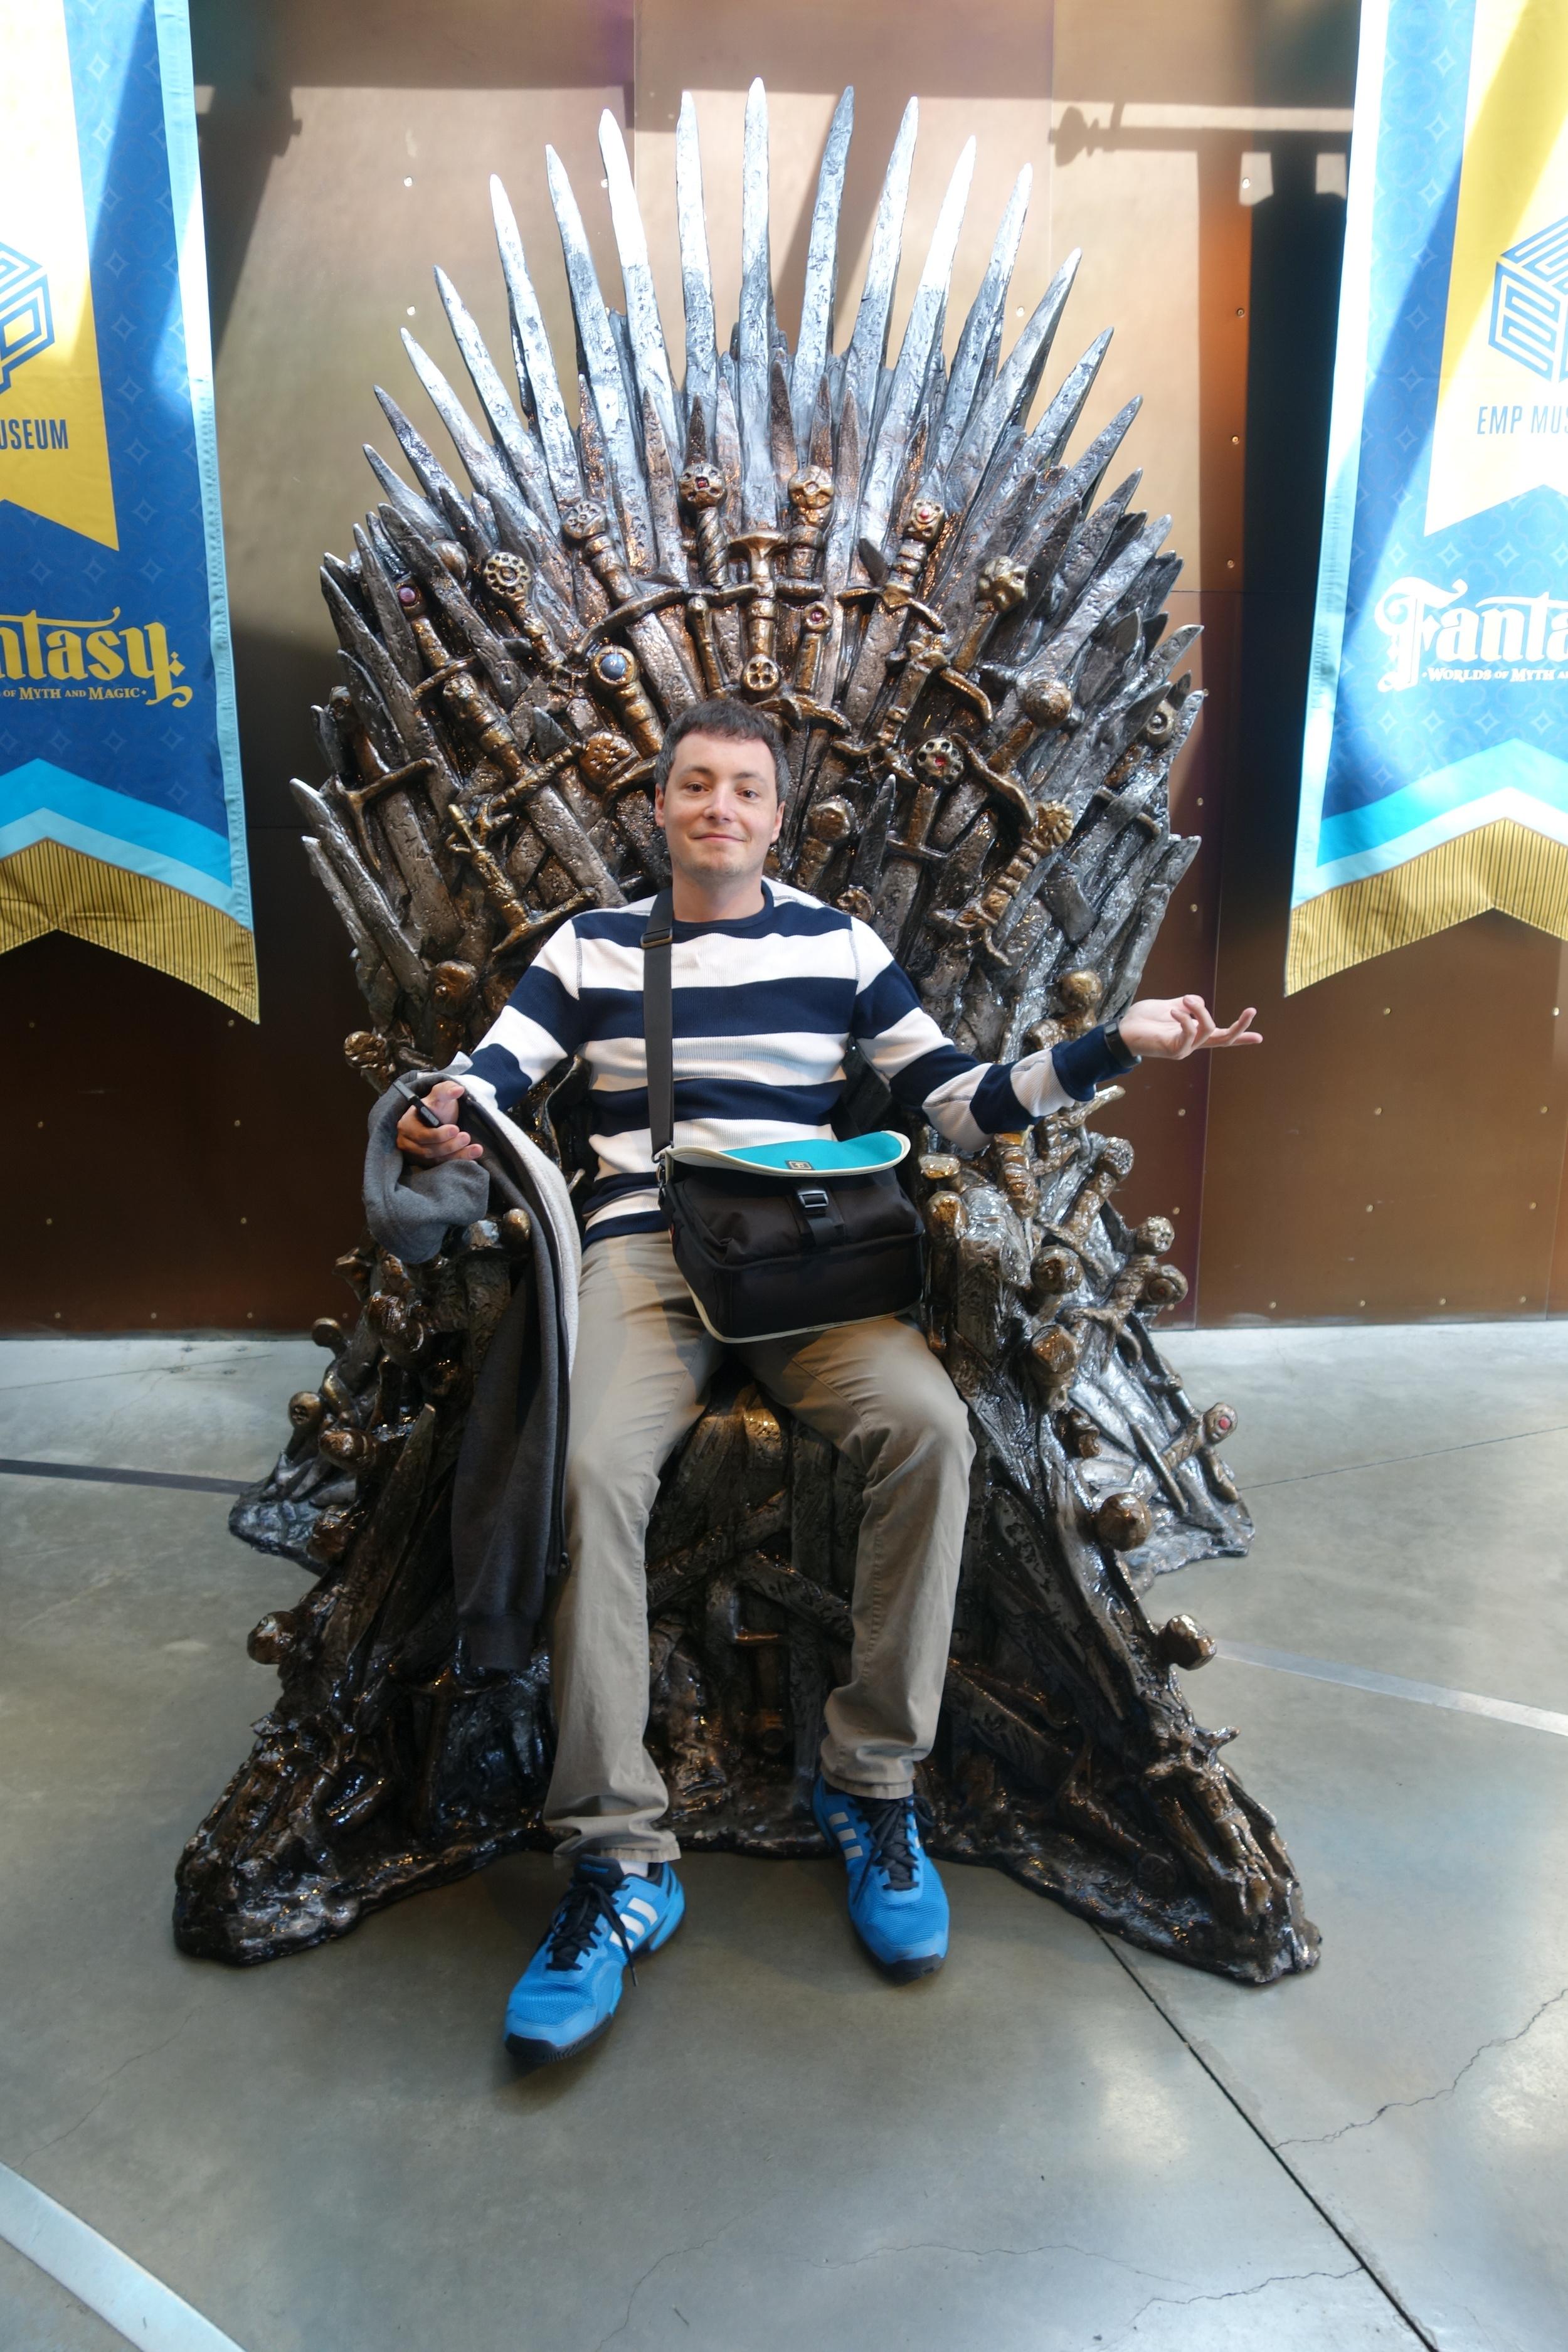 DSC00879 Me on the Throne.JPG